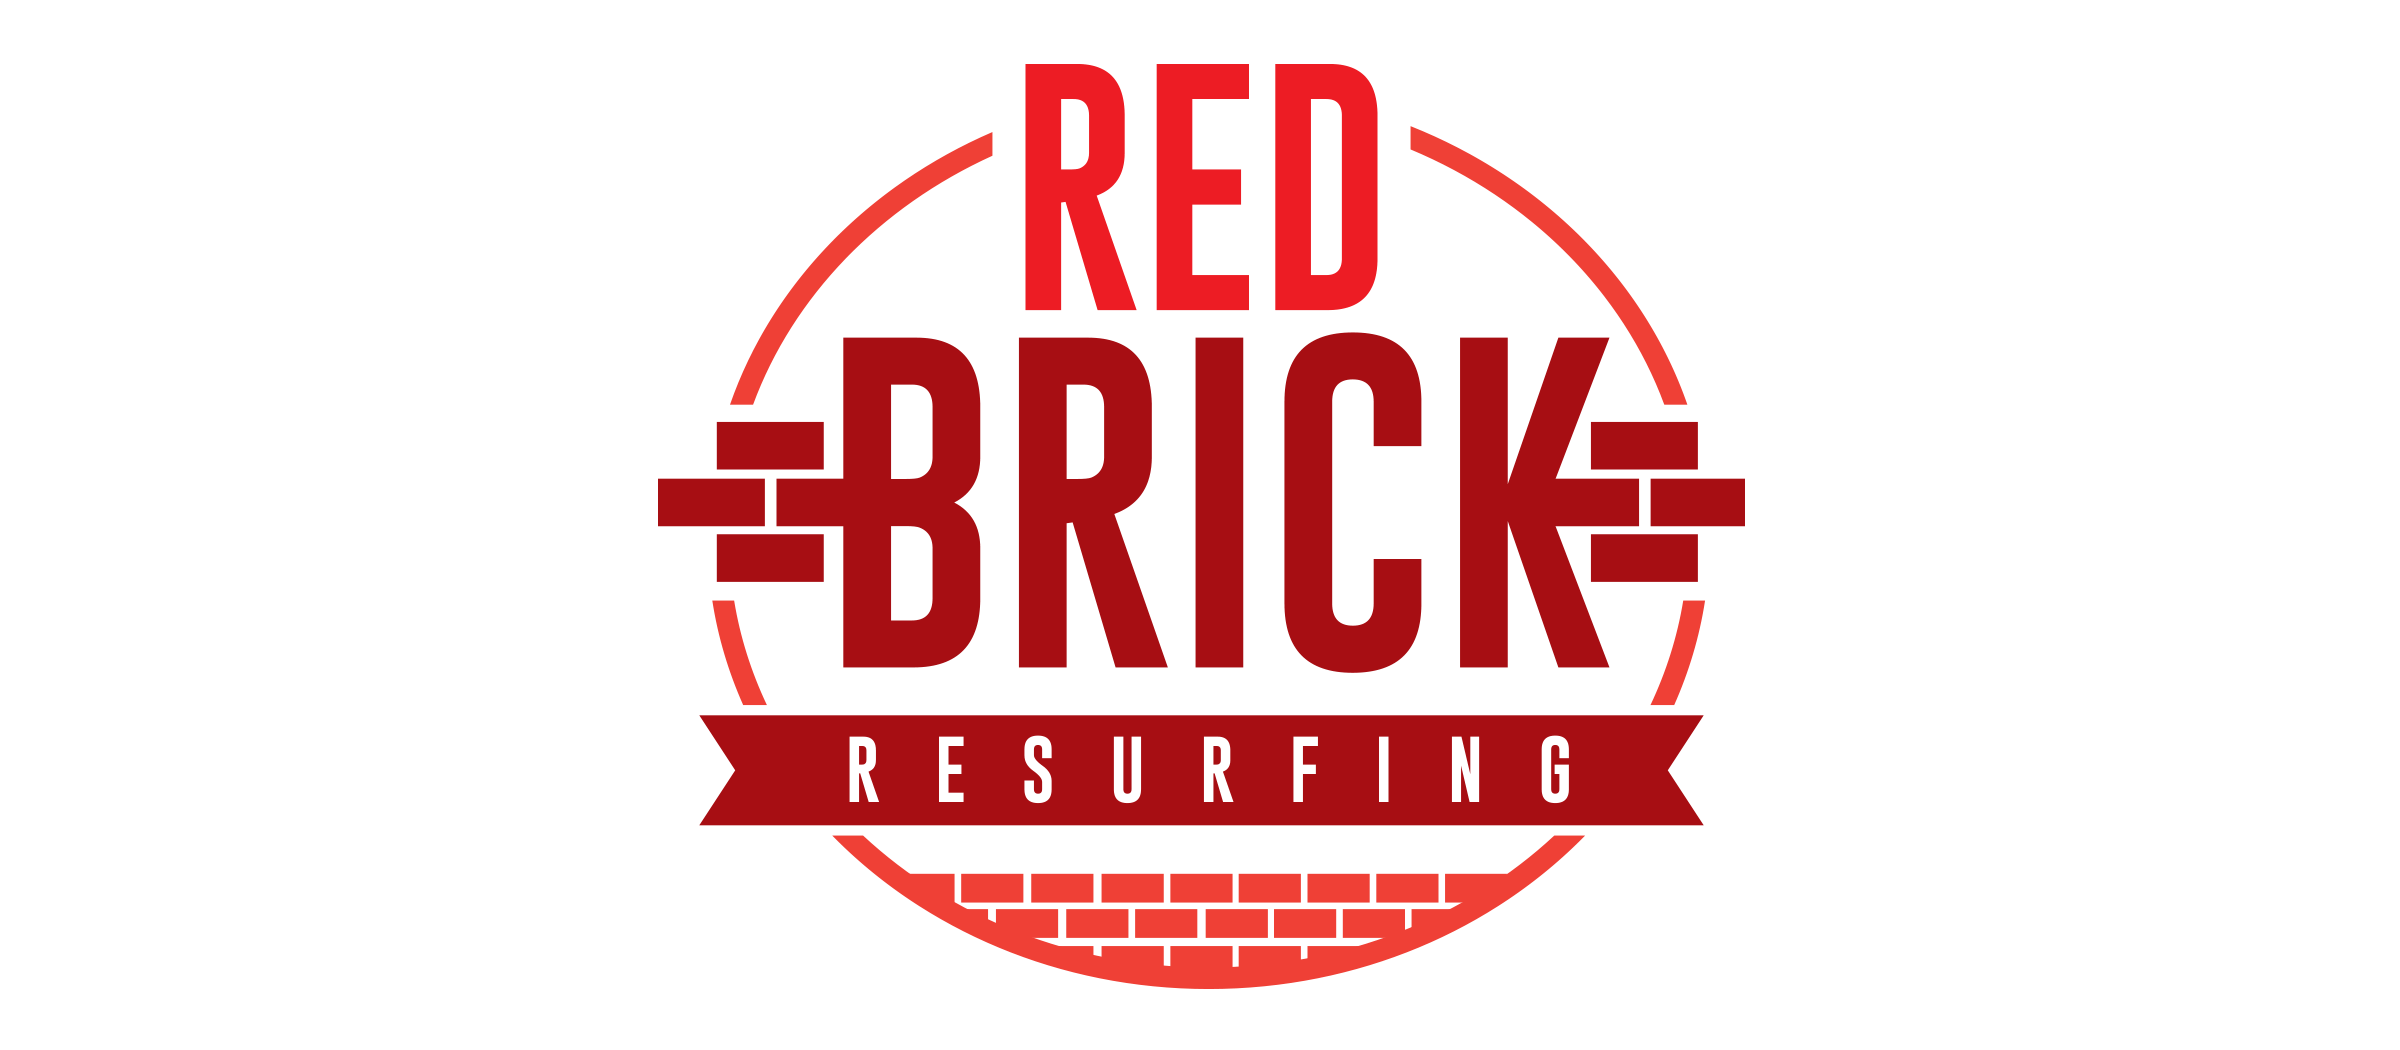 World Patent Marketing Success Team Presents Red Brick